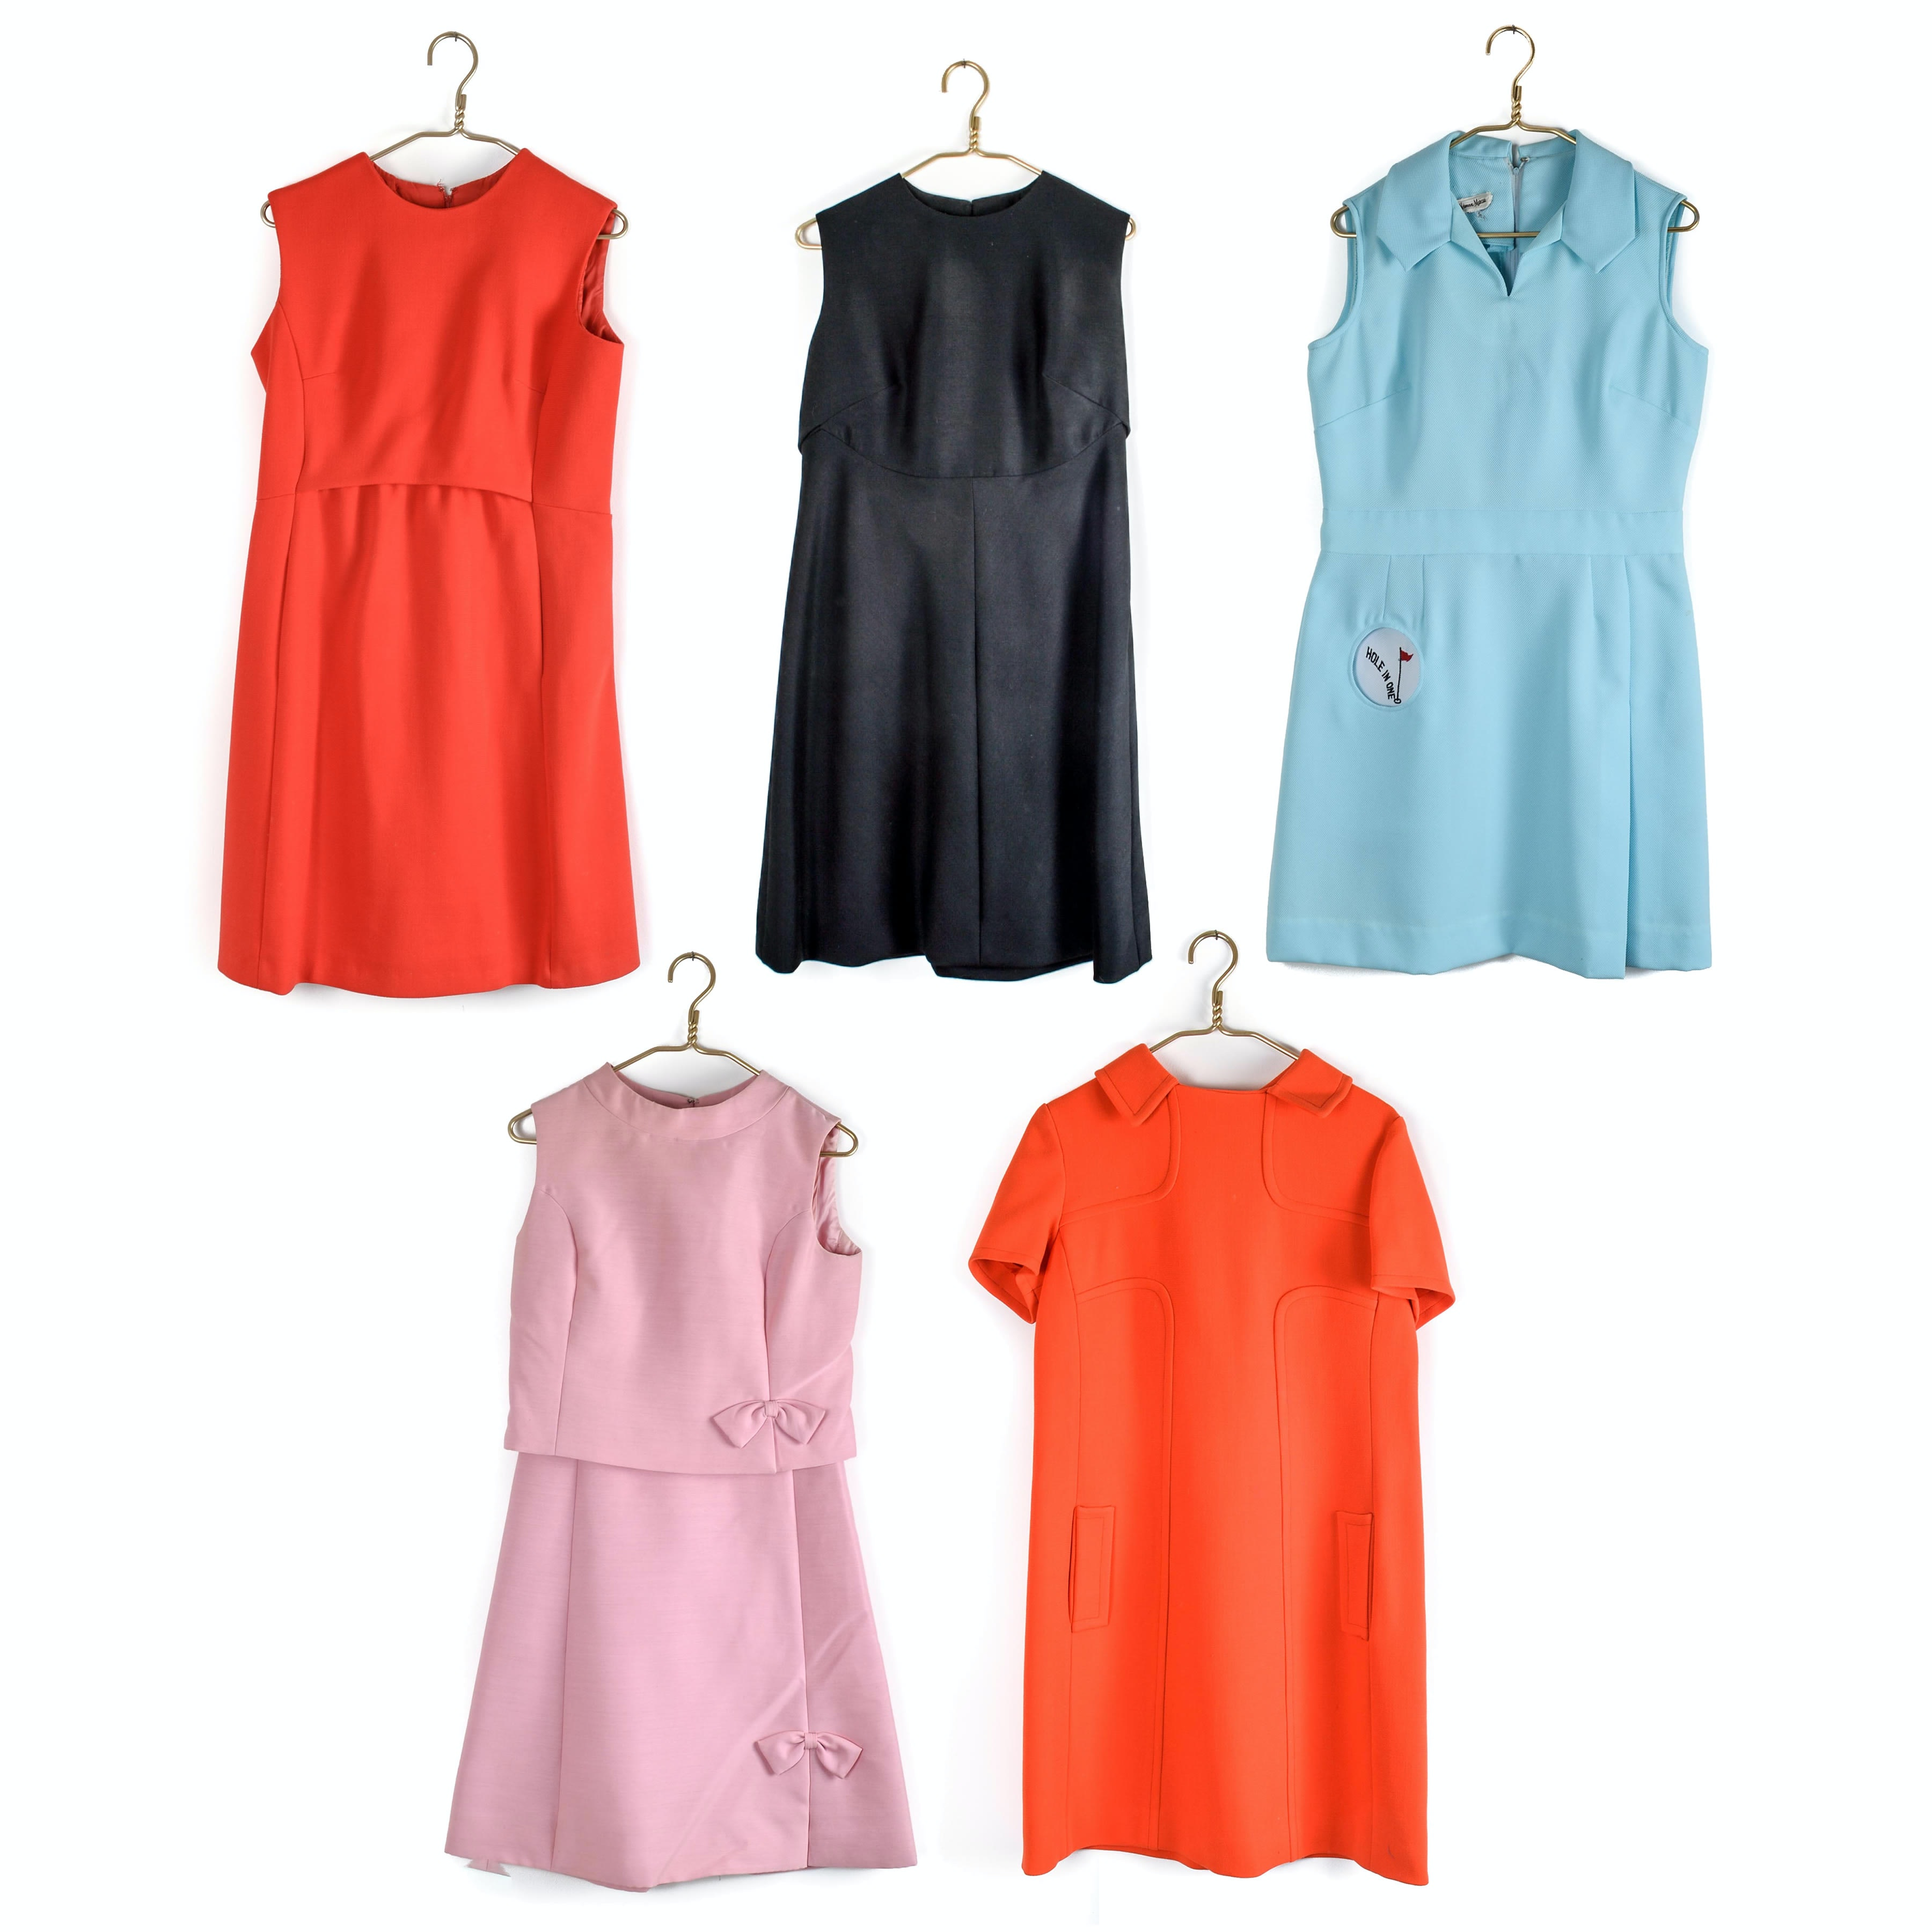 1960s Shift Dresses